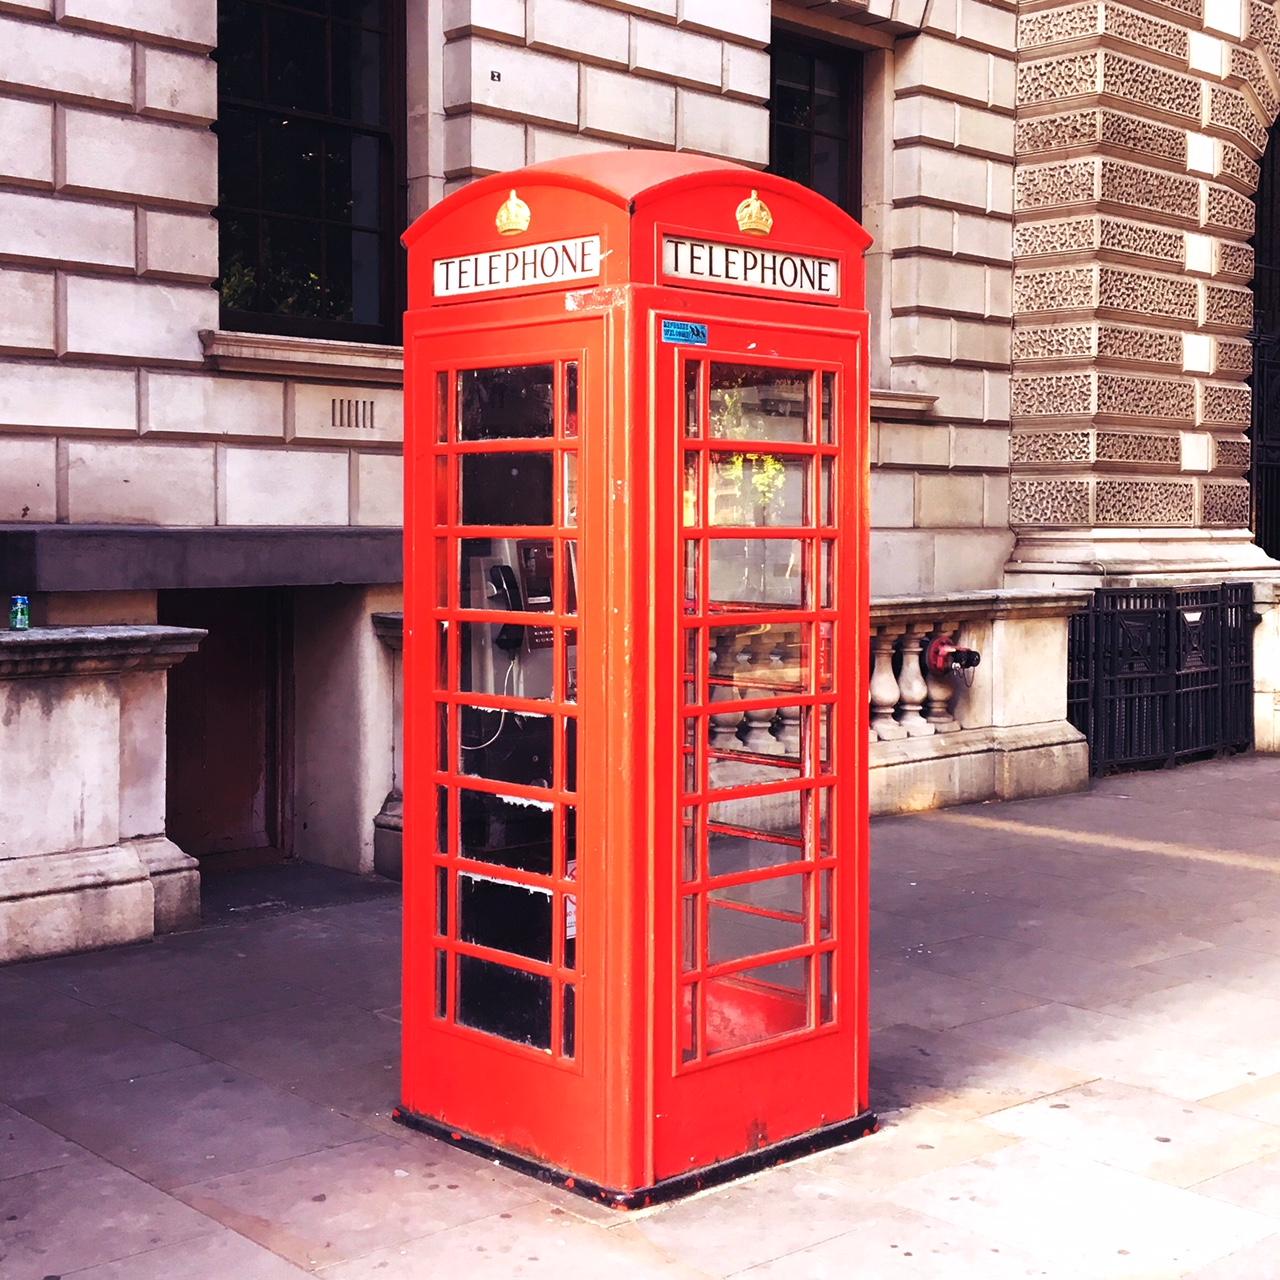 A British cultural icon, London, England